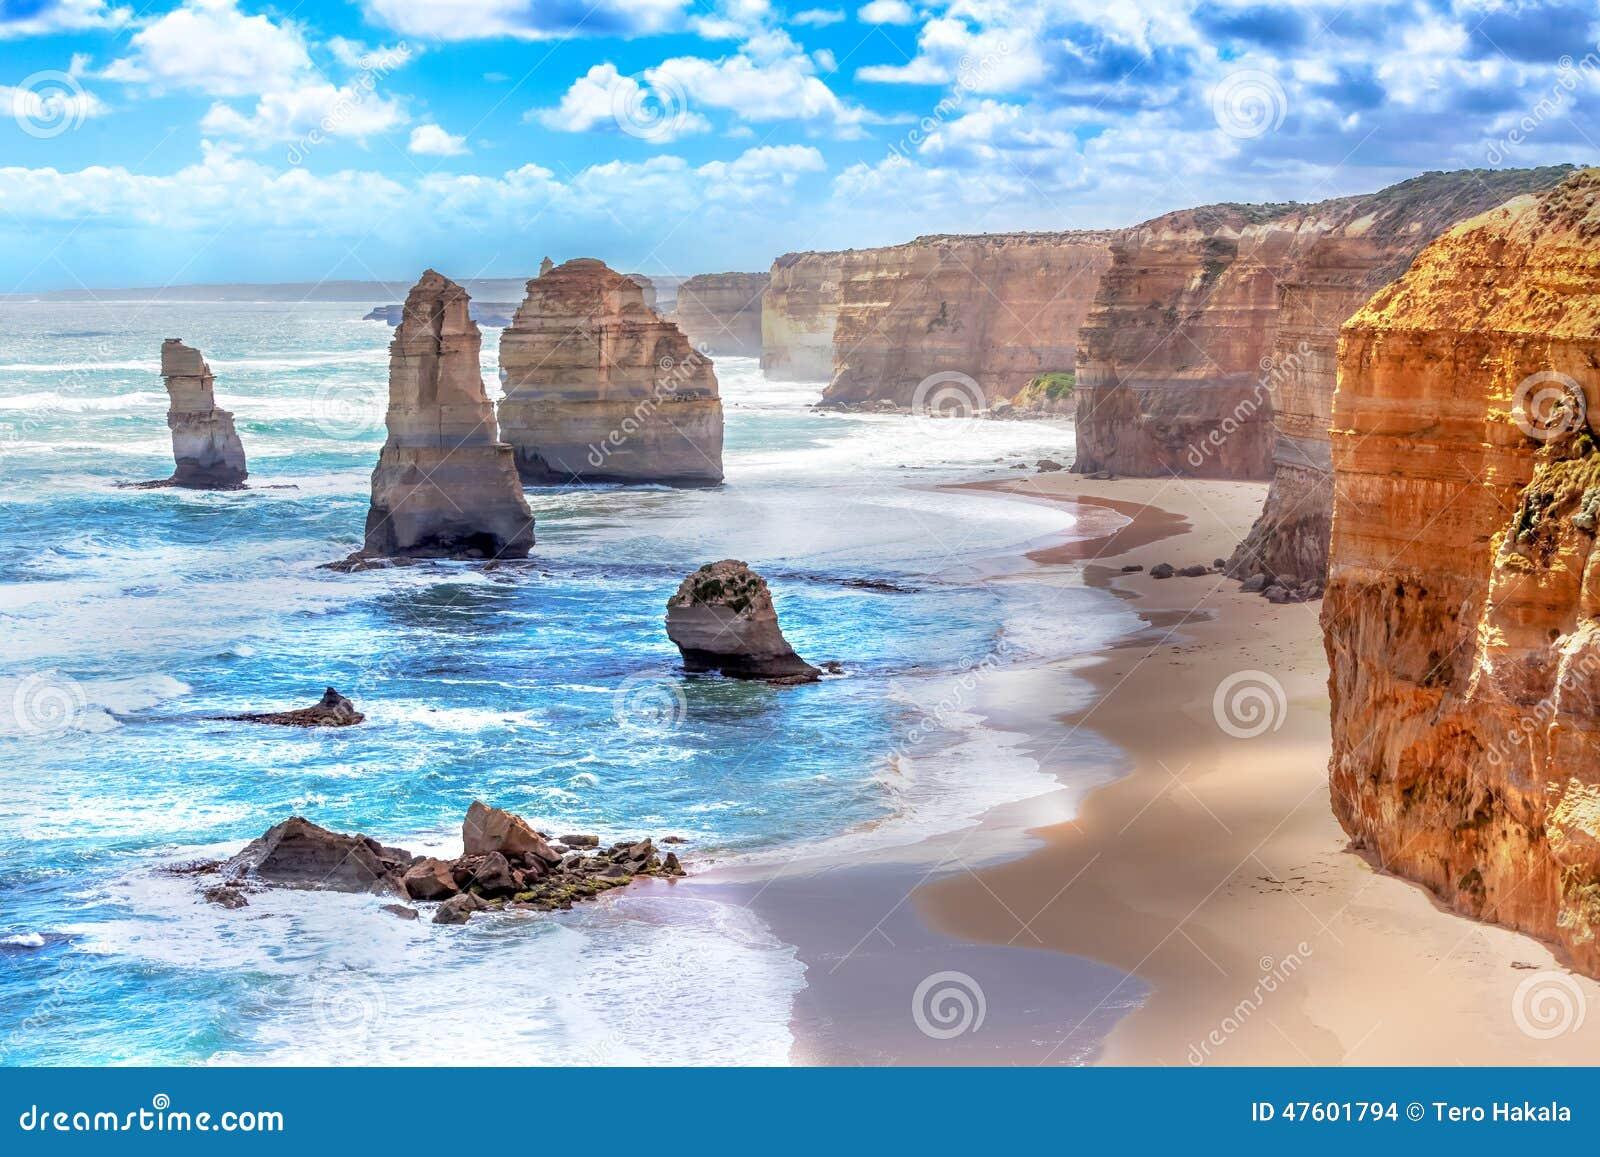 Zwölf Apostel entlang der großen Ozean-Straße in Australien